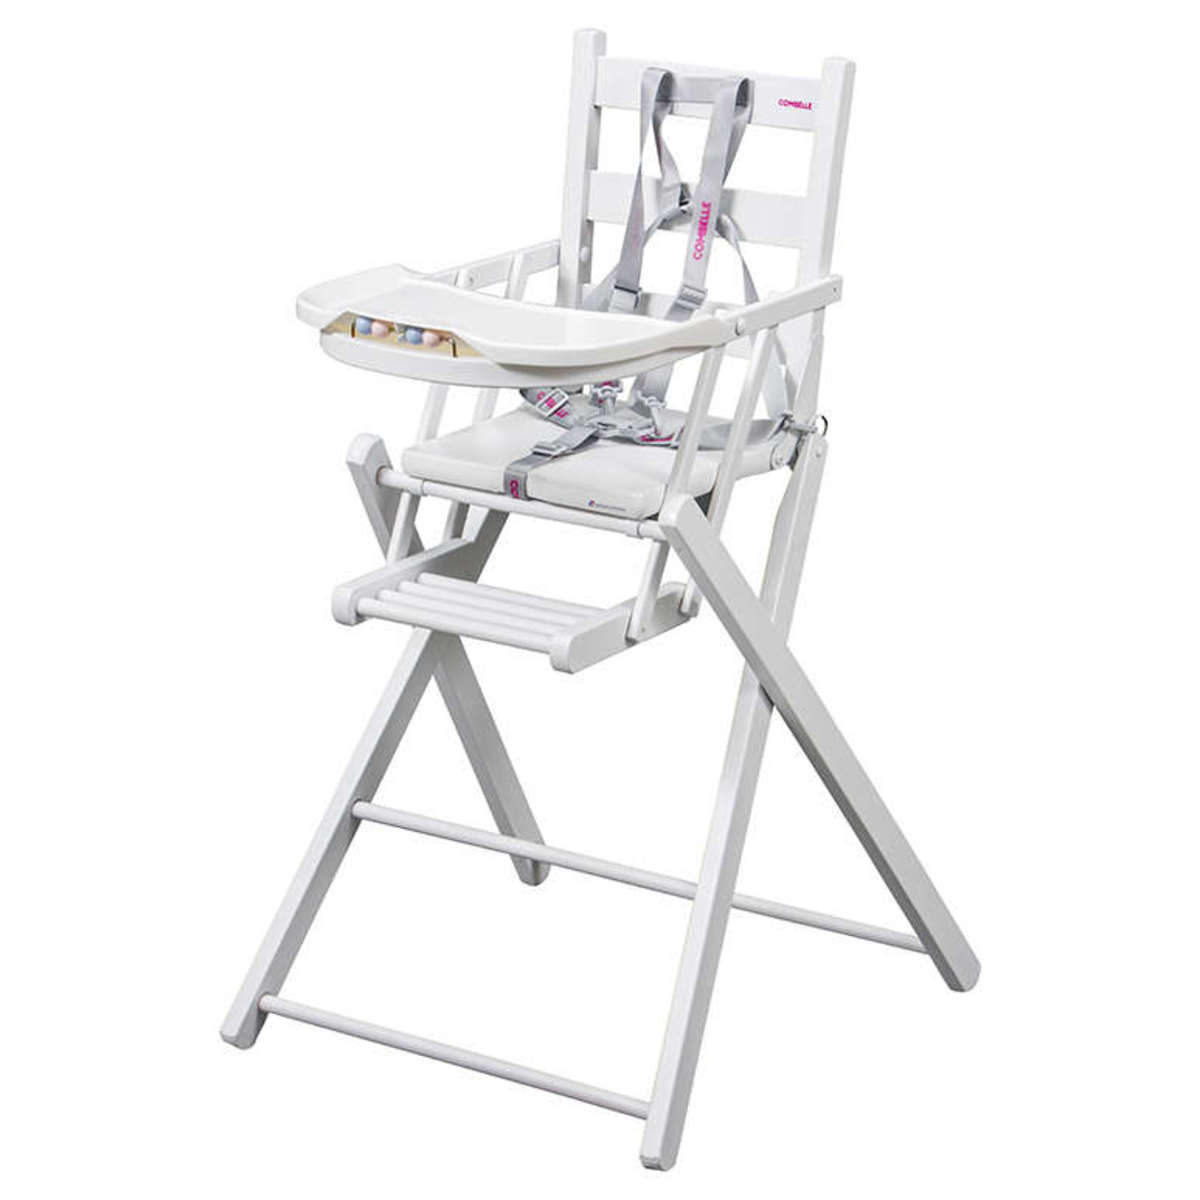 Chaise haute Chaise Haute Extra-Pliante Sarah - Blanc Chaise Haute Extra-Pliante Sarah - Blanc